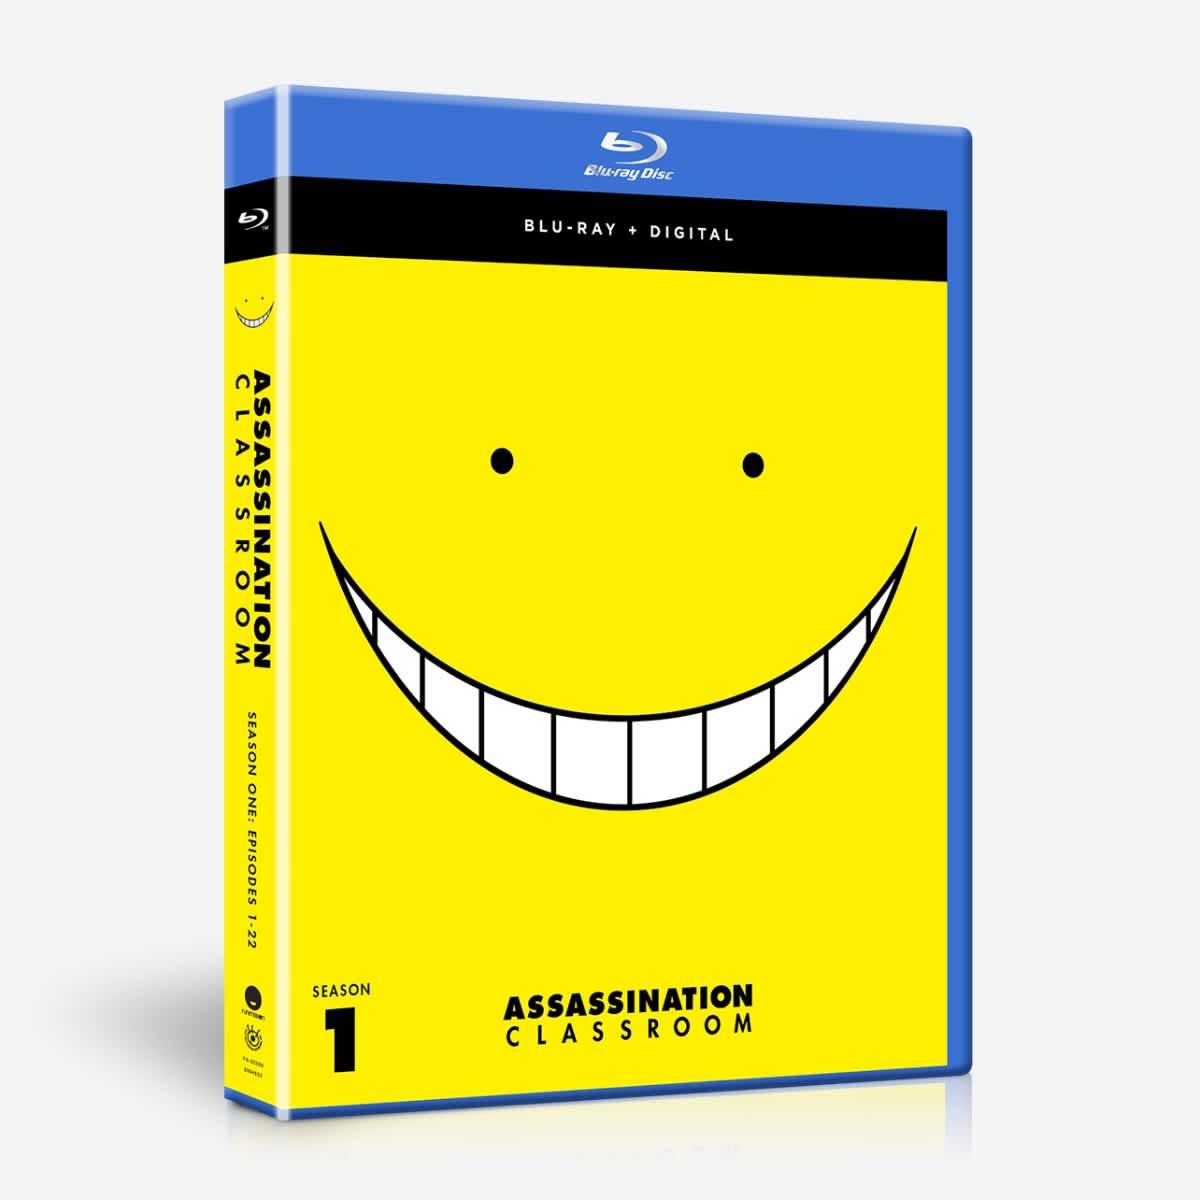 Assassination Classroom Season 1 Blu-ray 704400025006